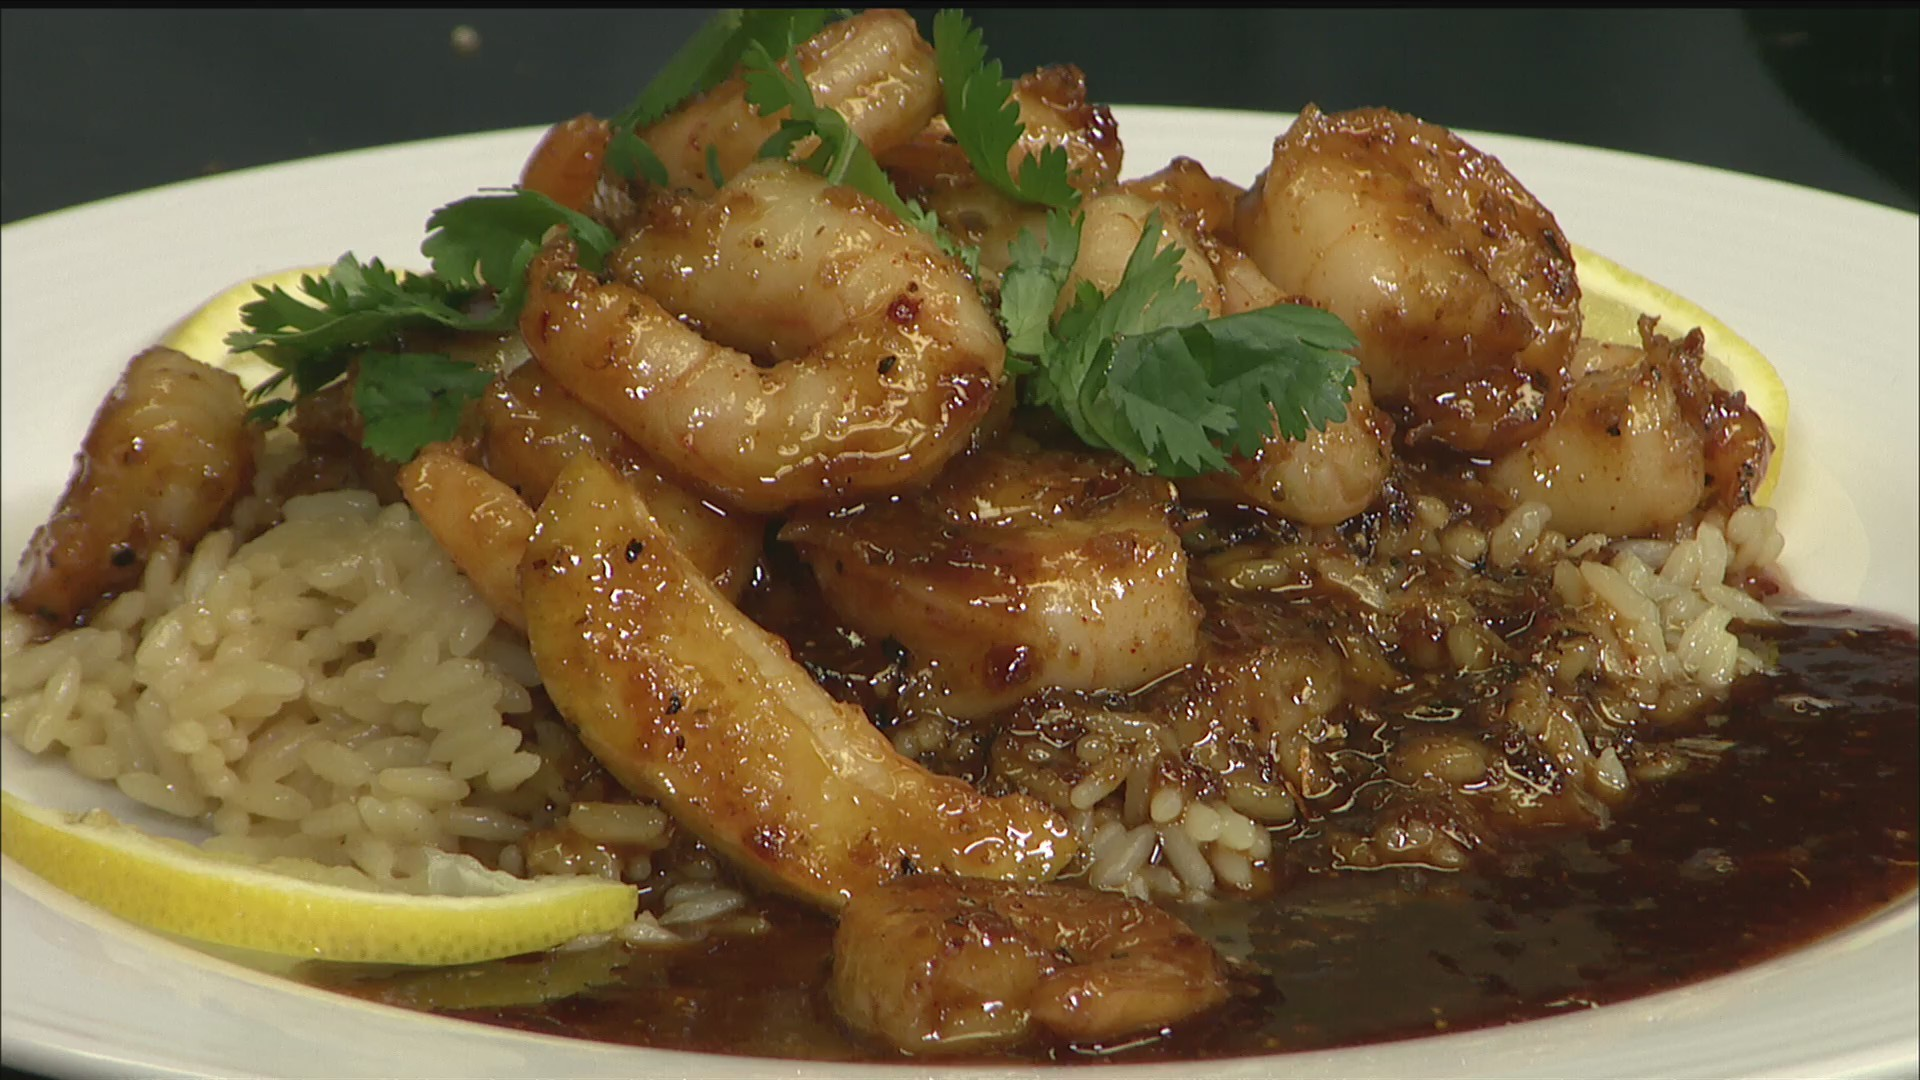 Back to the Table with Chef Bud - Cajun Garlic Shrimp pt 2